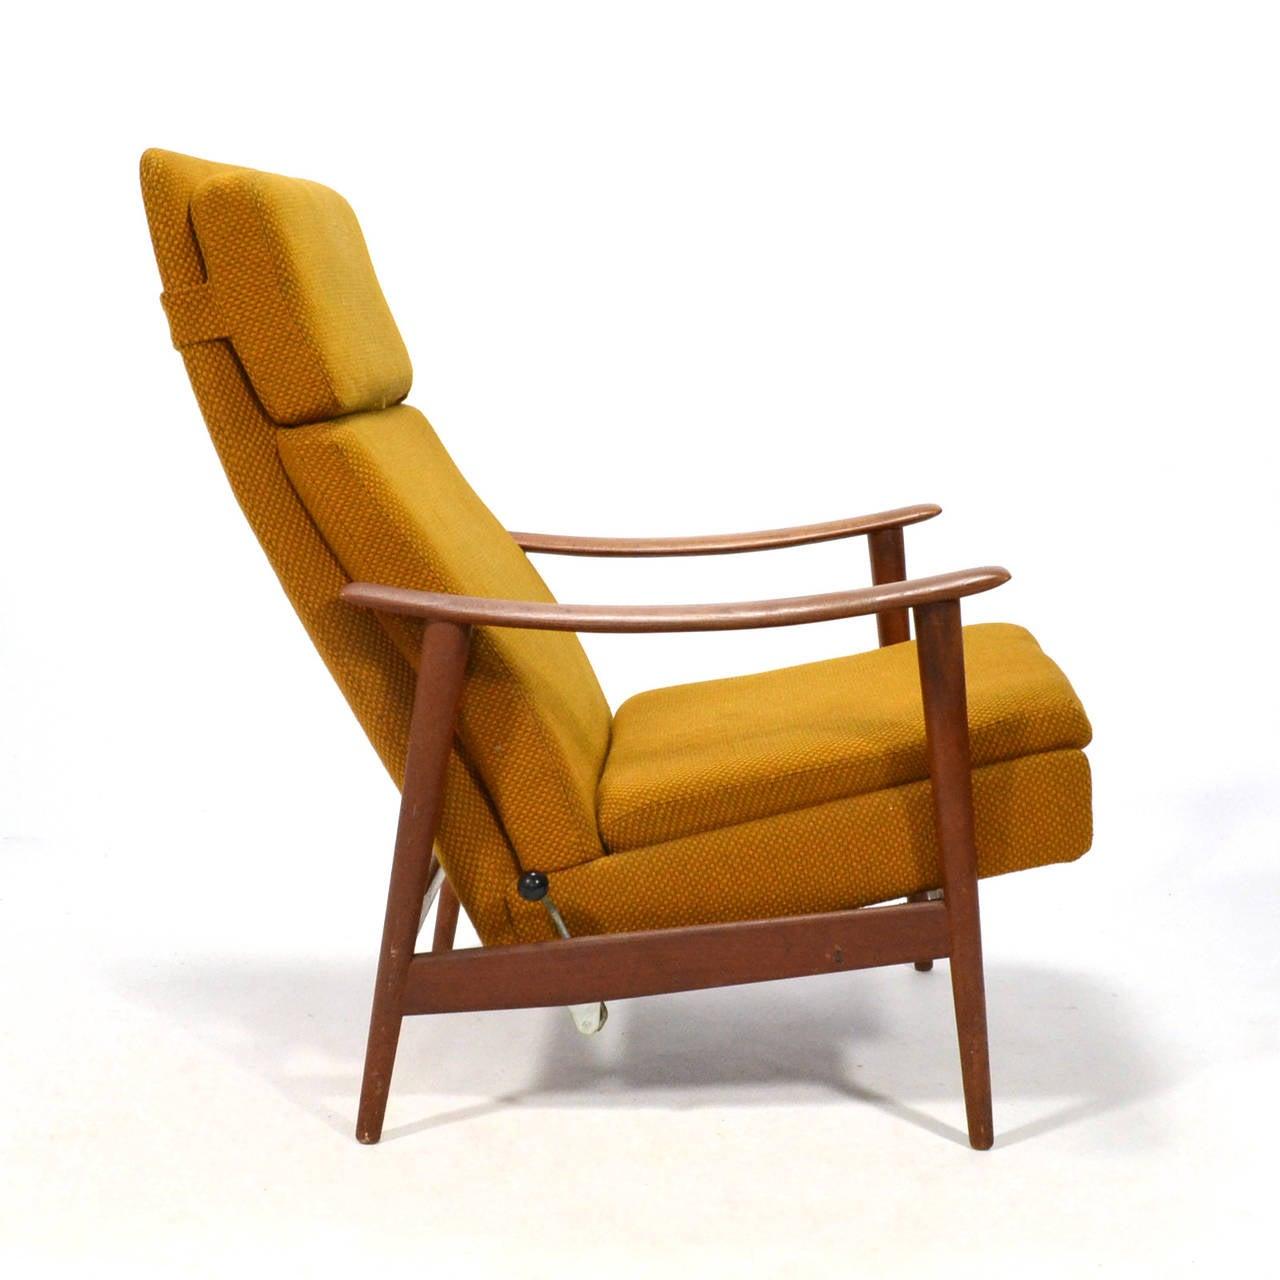 teak lounge chair golden technologies lift chairs danish reclining at 1stdibs